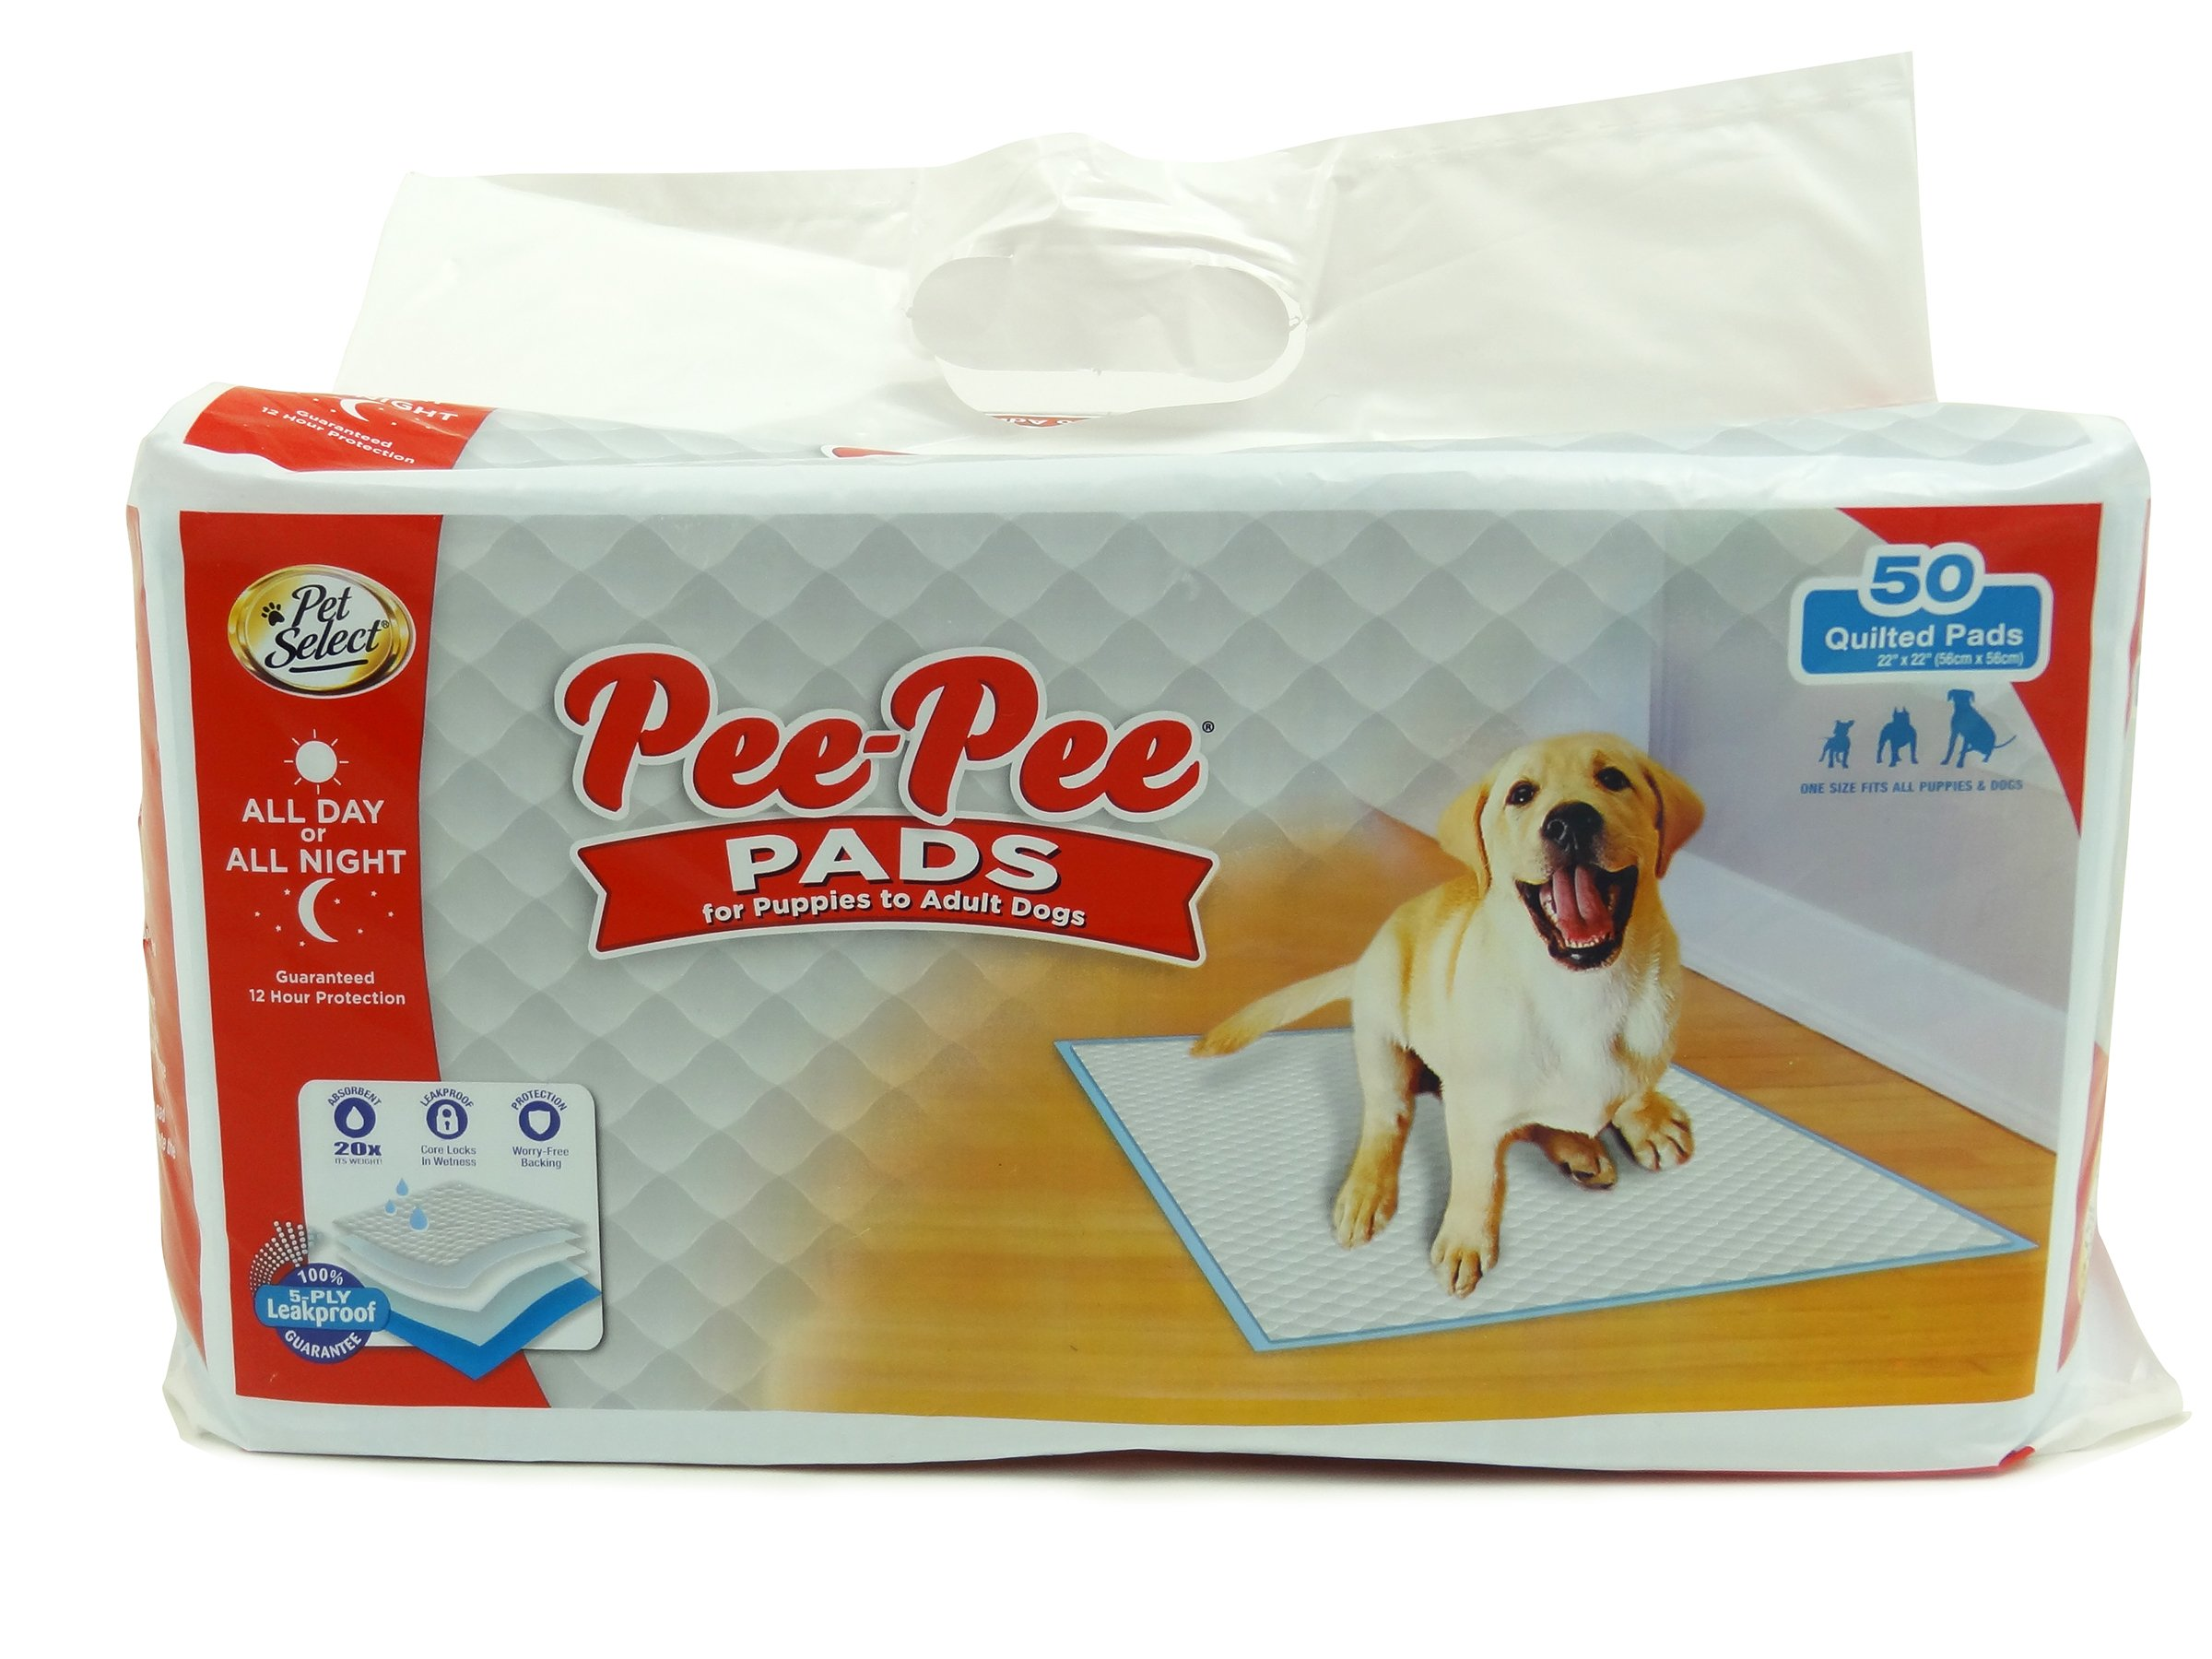 Pet Select Puppy Pads, 50 Ct